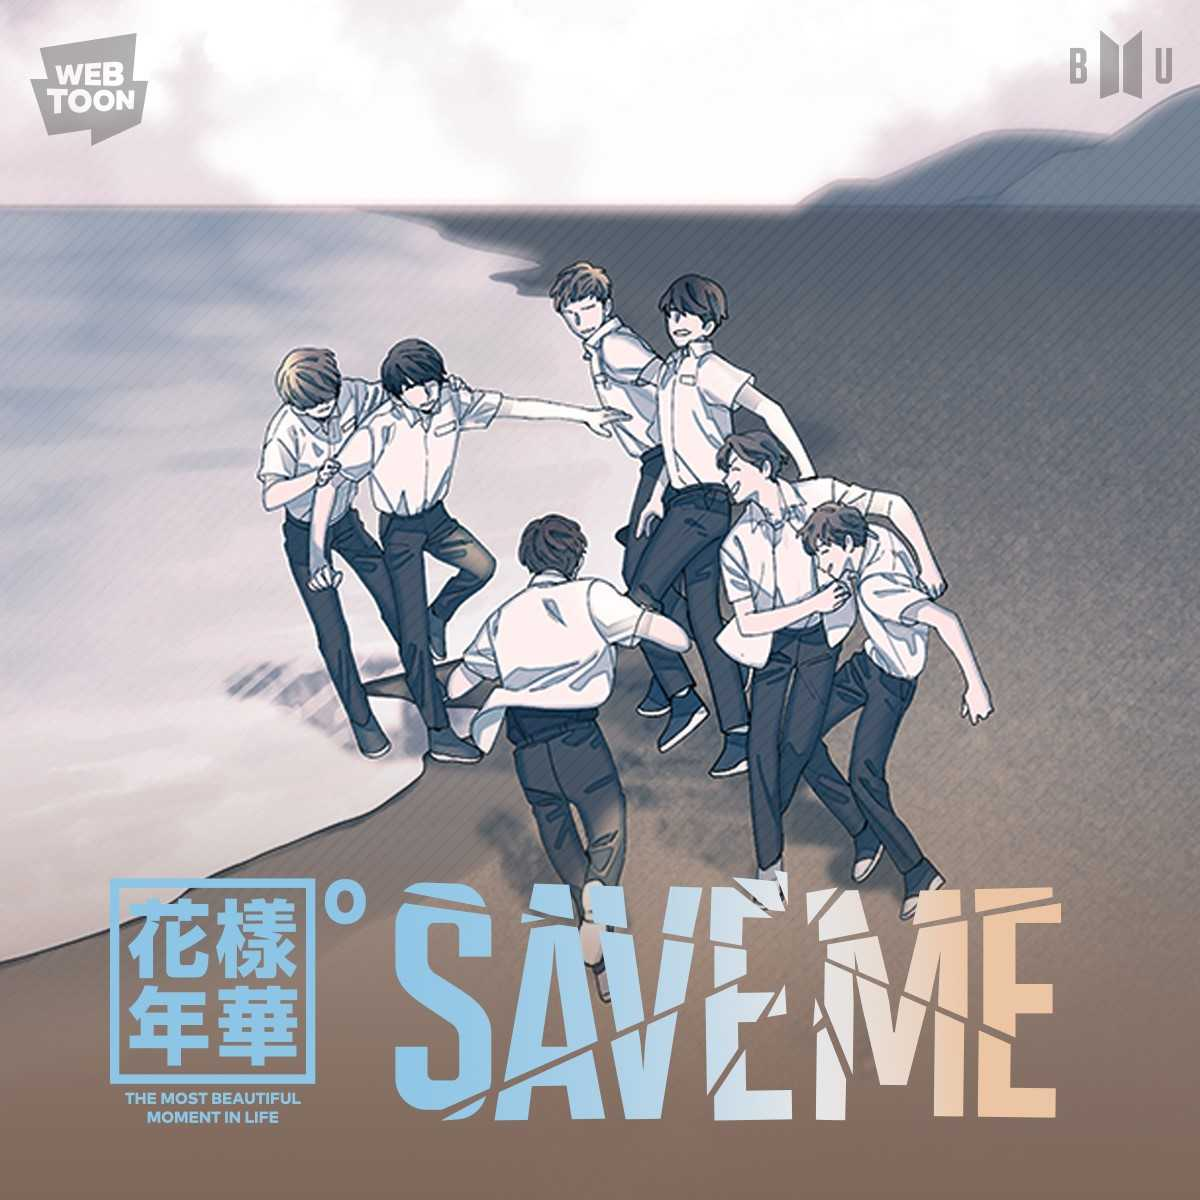 Twinklestar11 Images Bts Webtoon Series Save Me Photos Hd Wallpaper